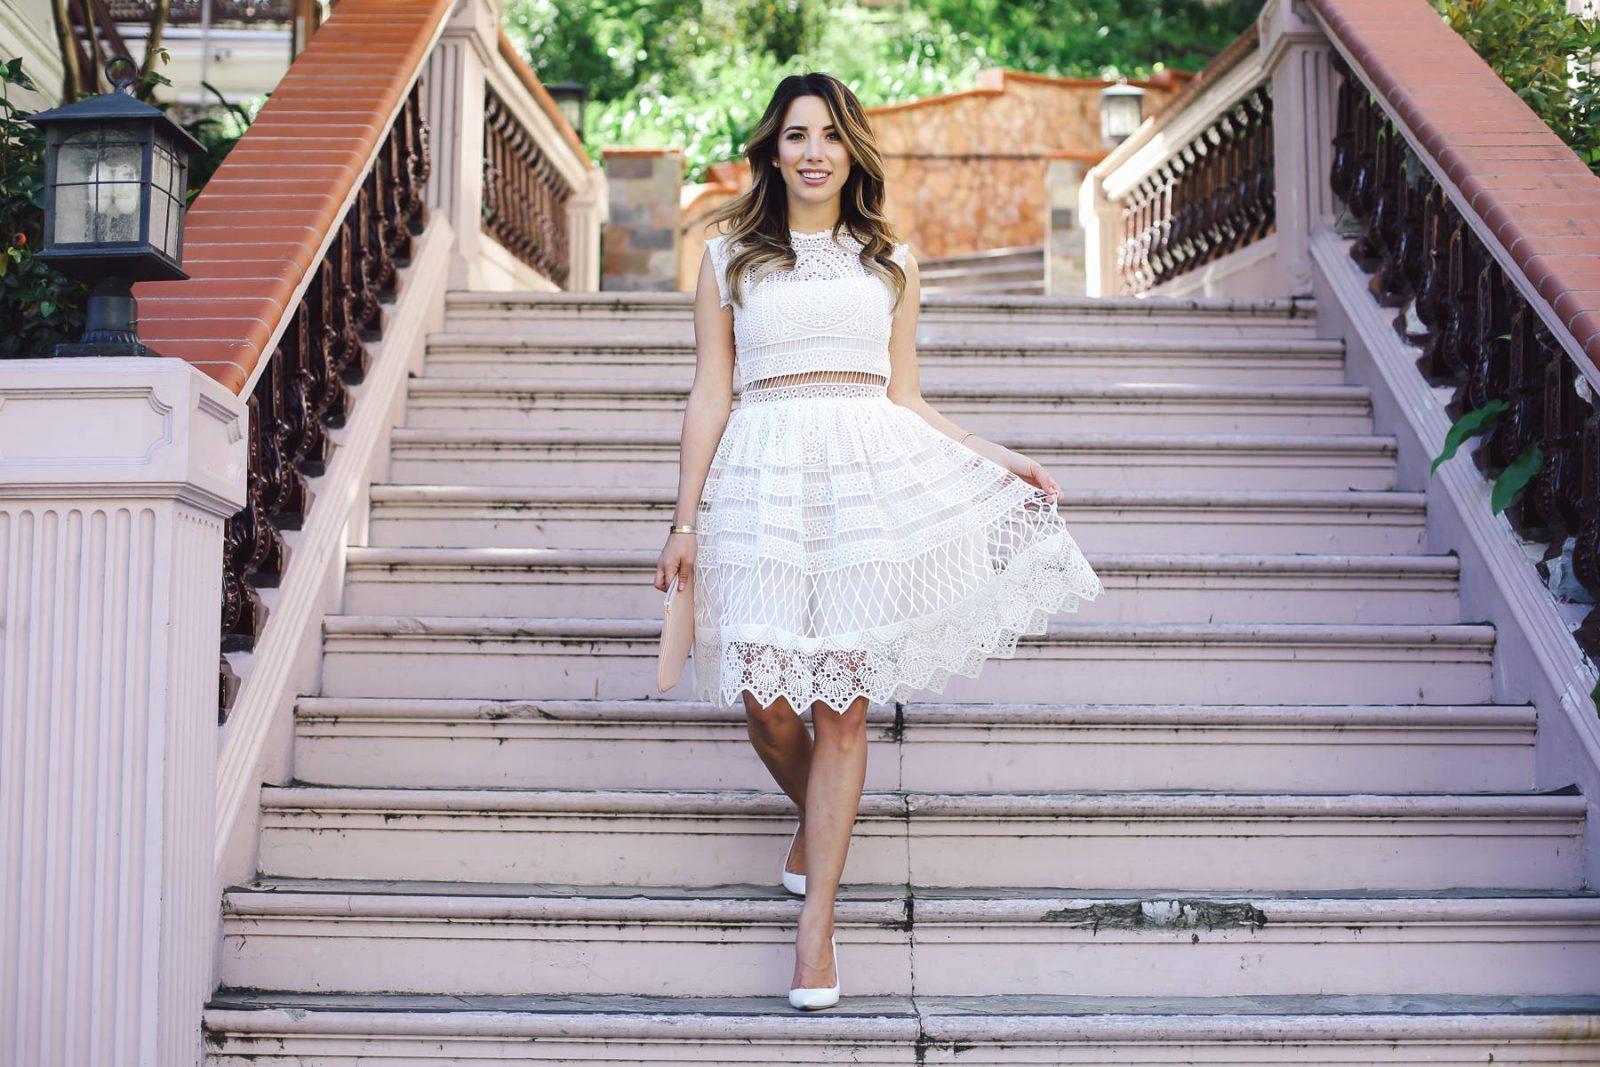 Ariana-Lauren-Fashionborn-White-Laced-Skater-Dress-Fashion-Blogger-Photography-by-Ryan-Chua-8761